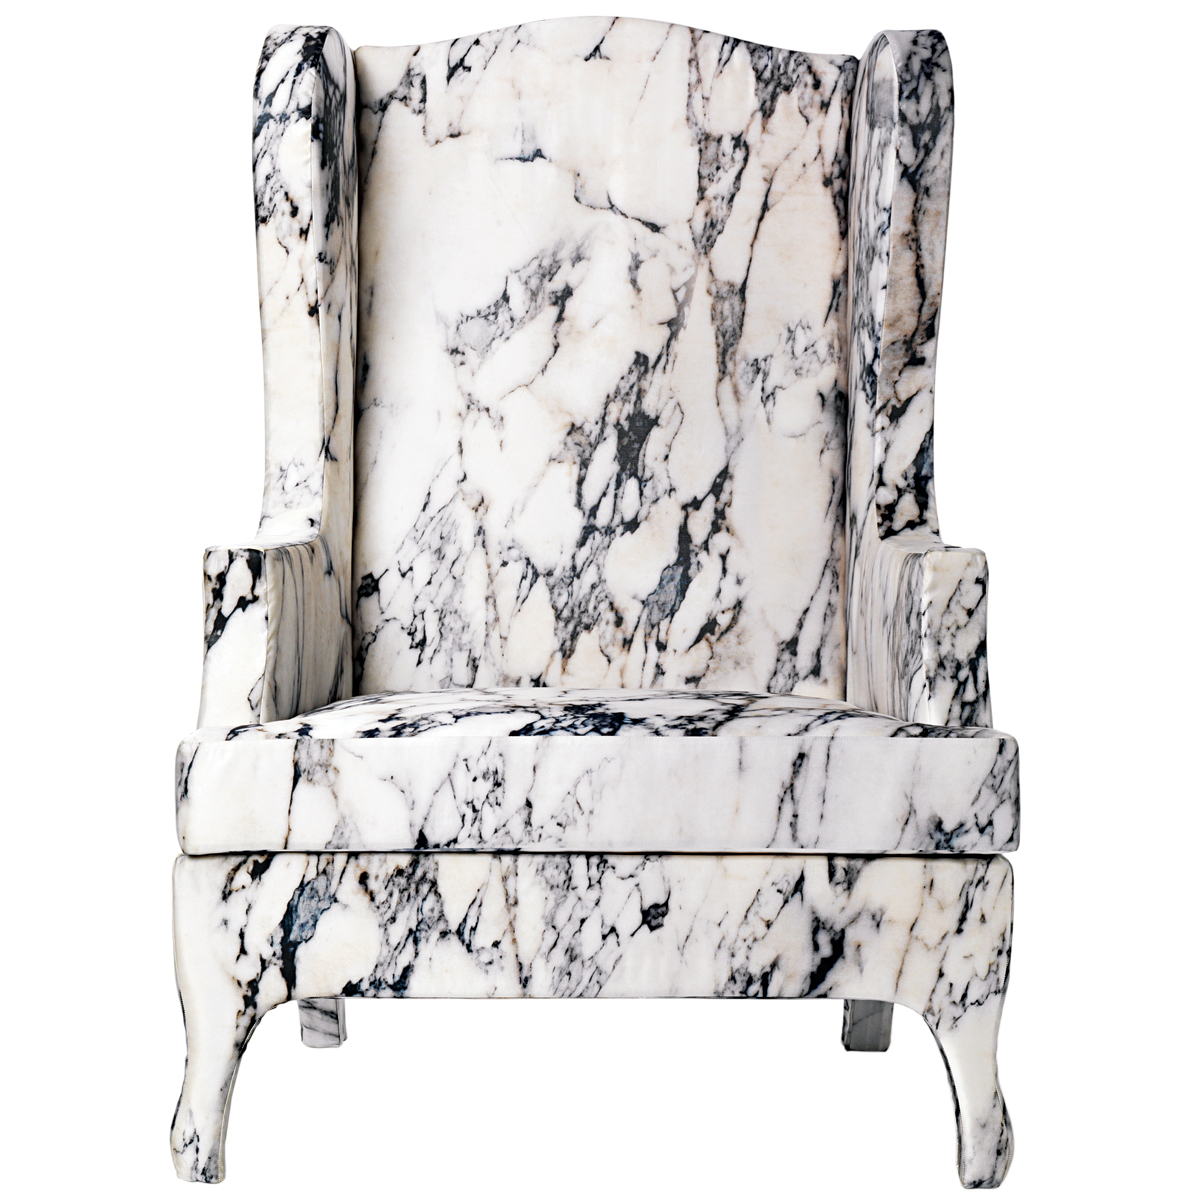 black-white-red-furniture-accessories-16